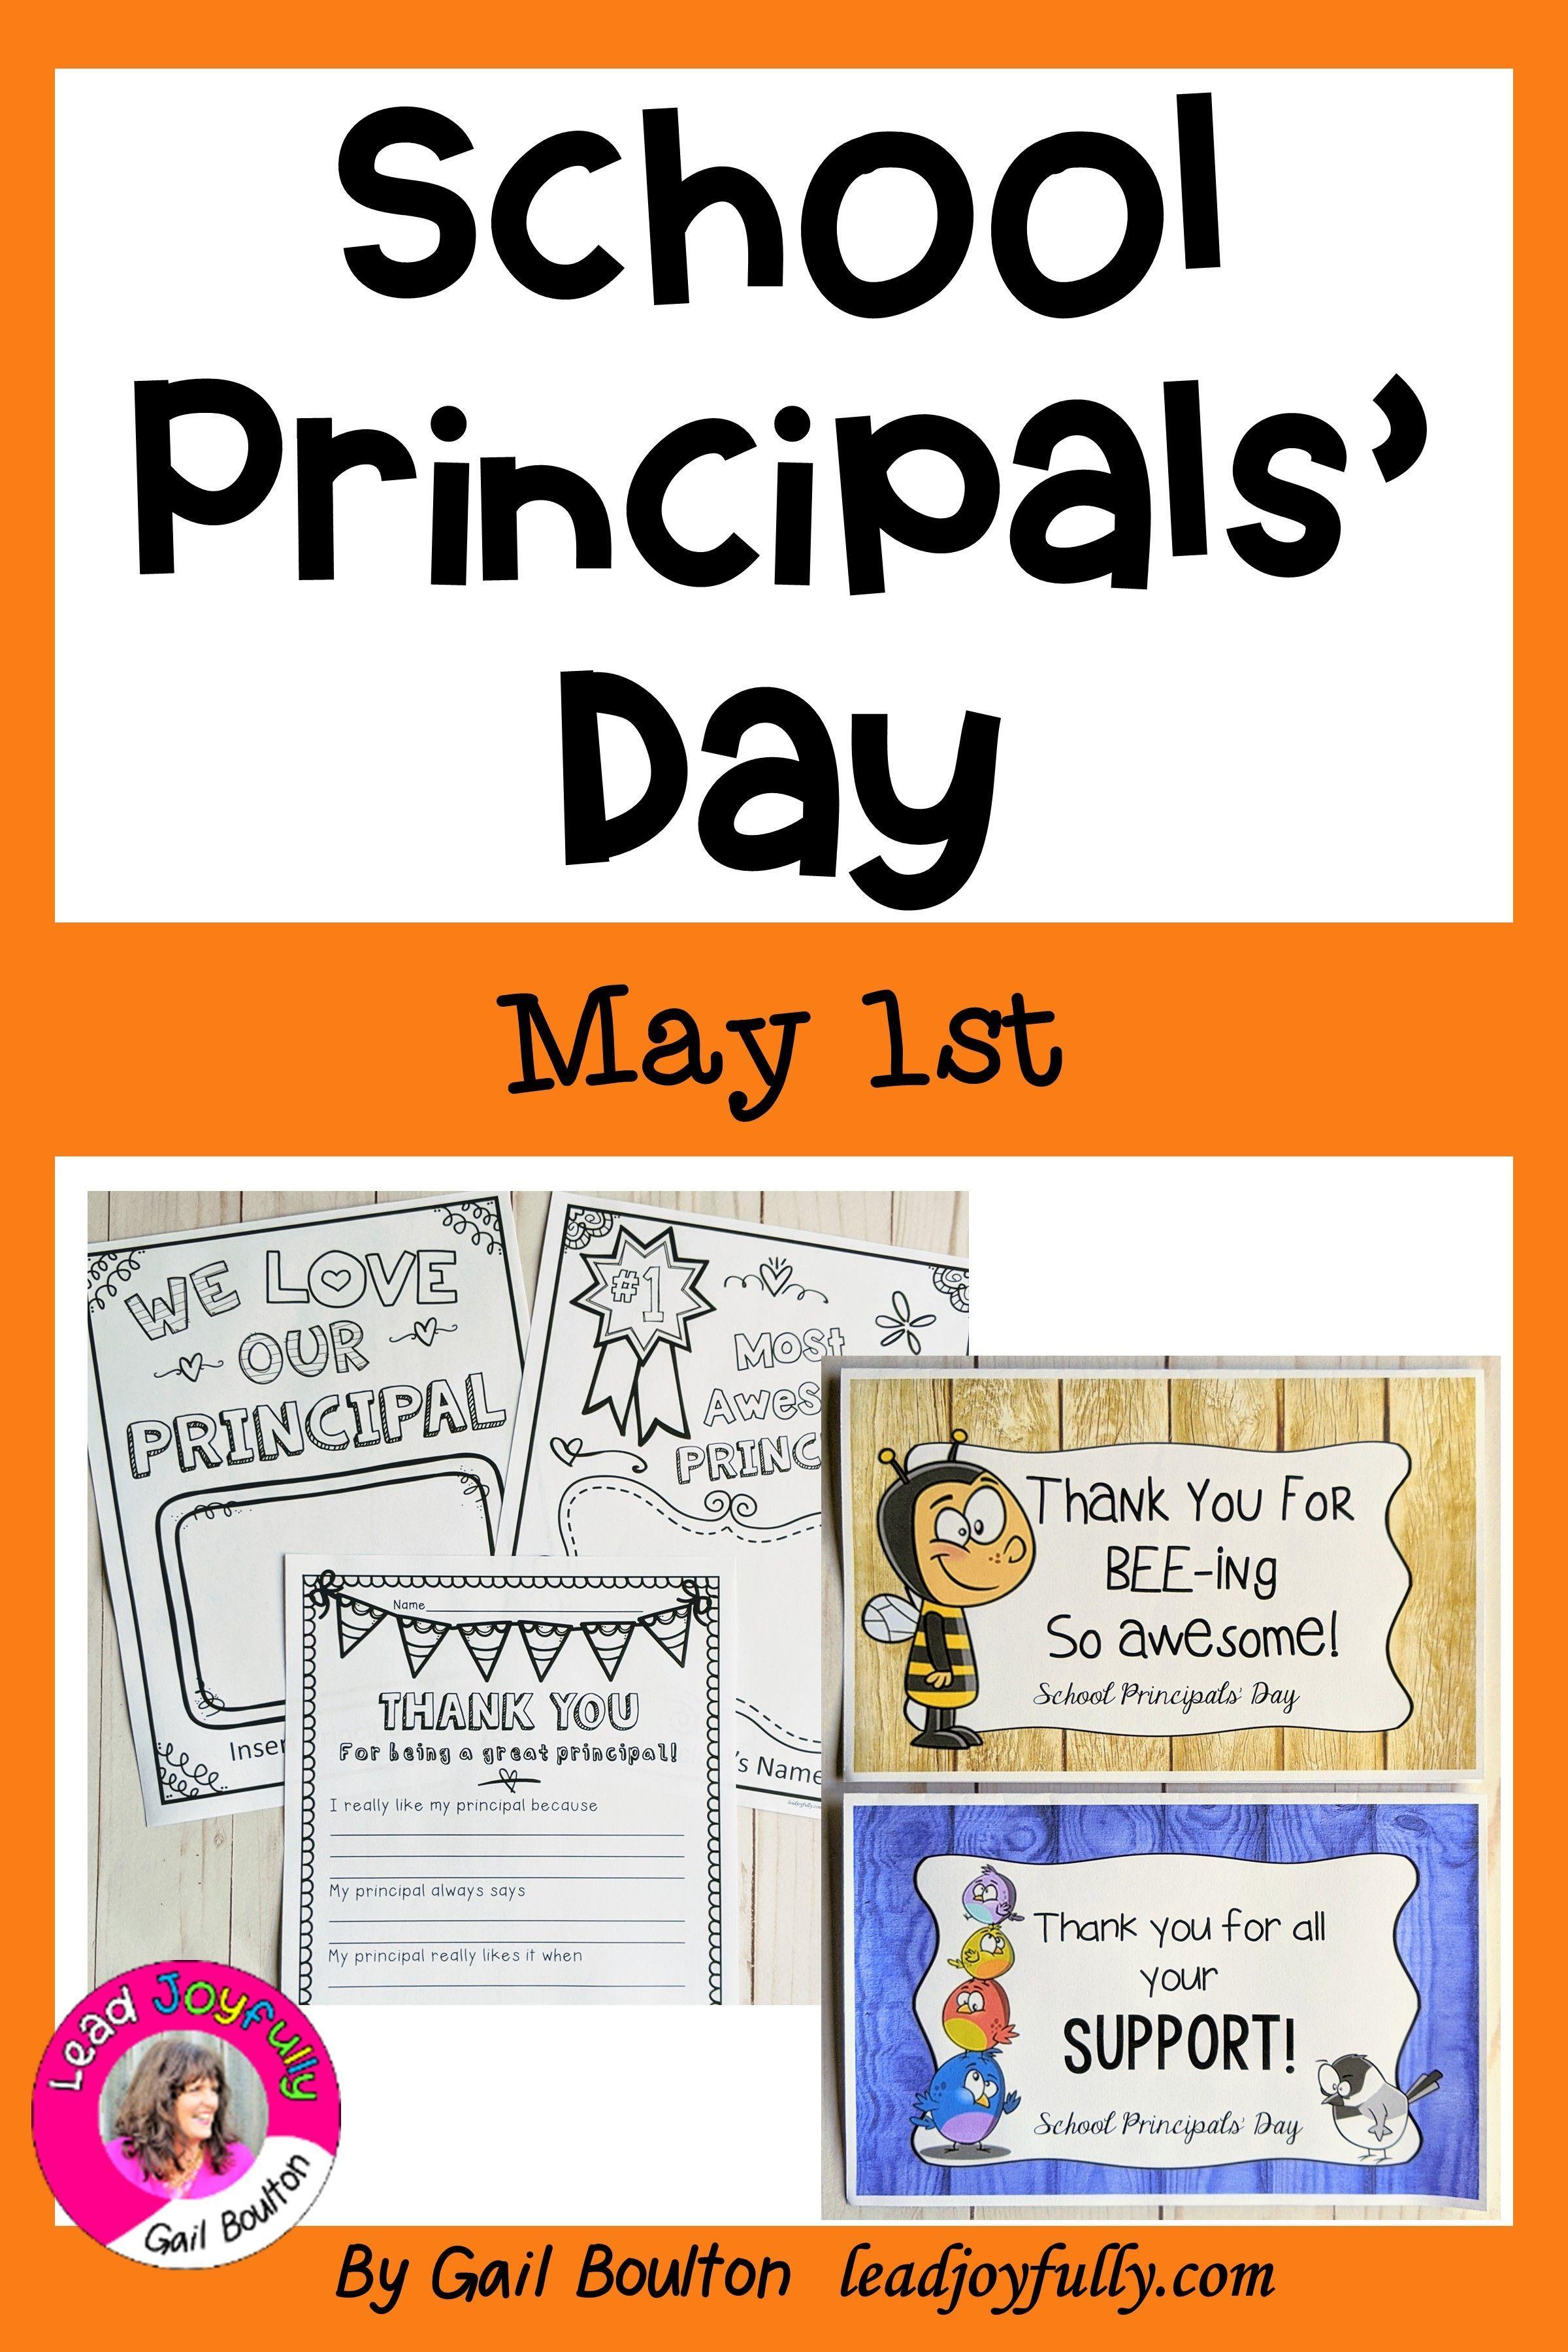 School Principals Day May 1st In 2020 Principals Day School